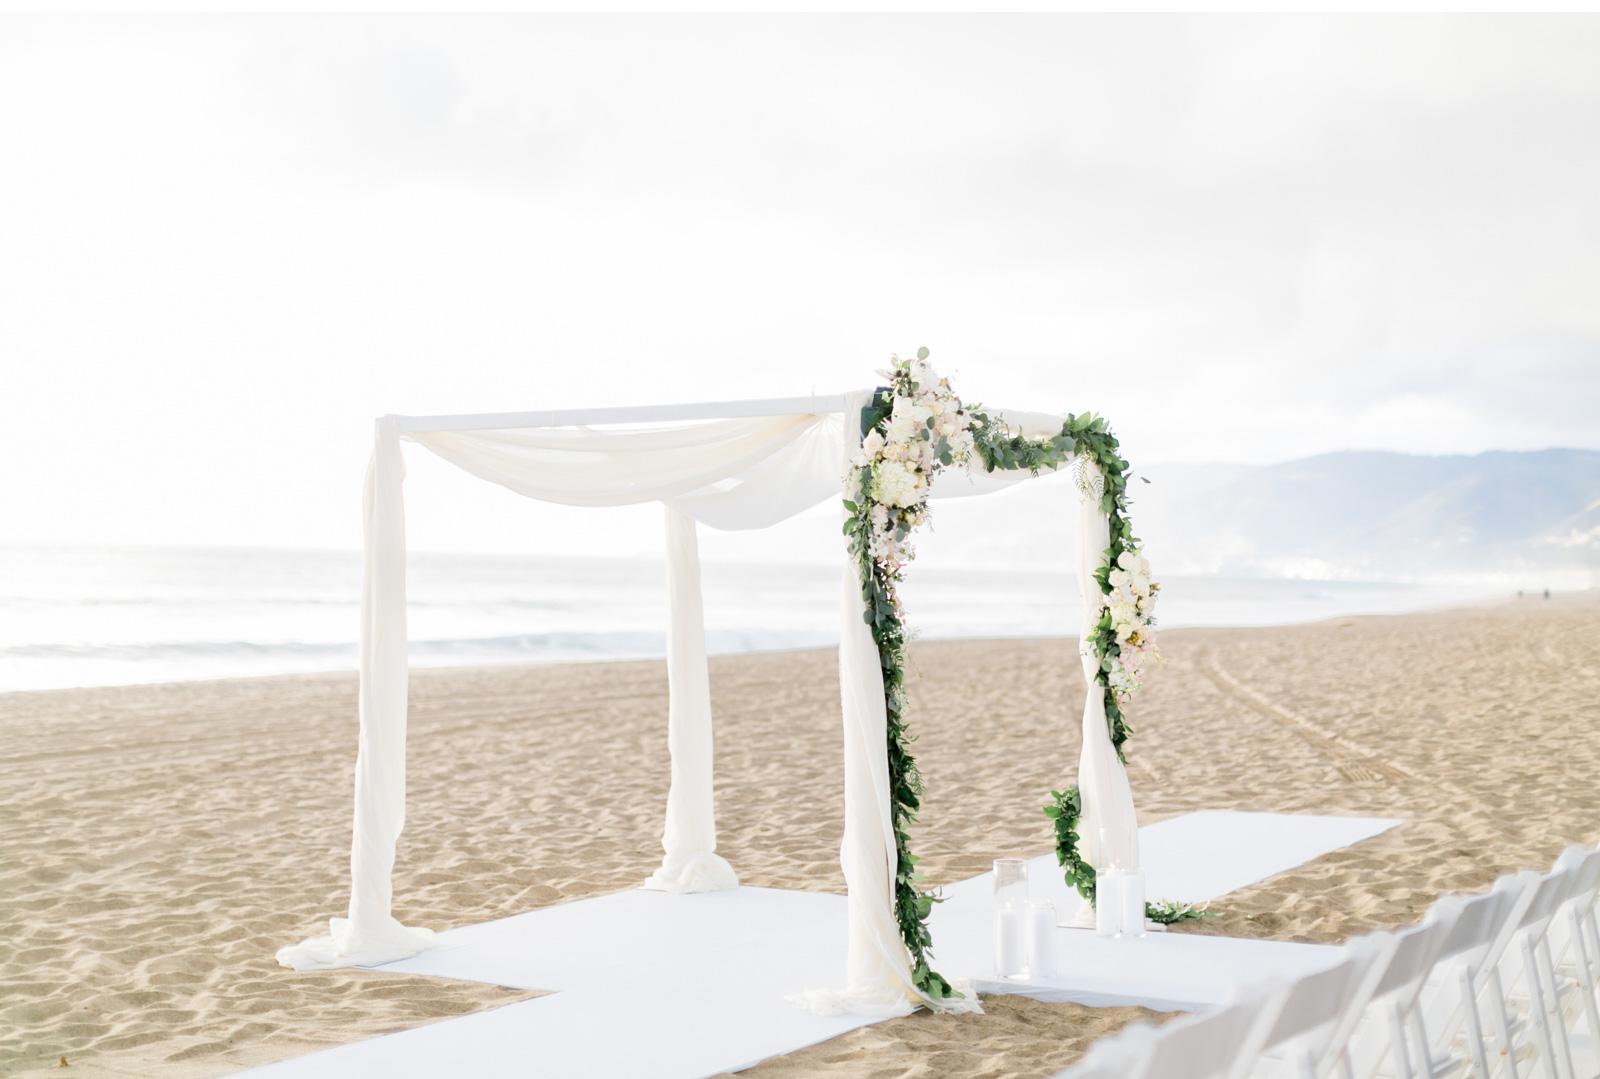 Sunset-Restaurant-Malibu-Beach-Wedding-Natalie-Schutt-Photography_09.jpg